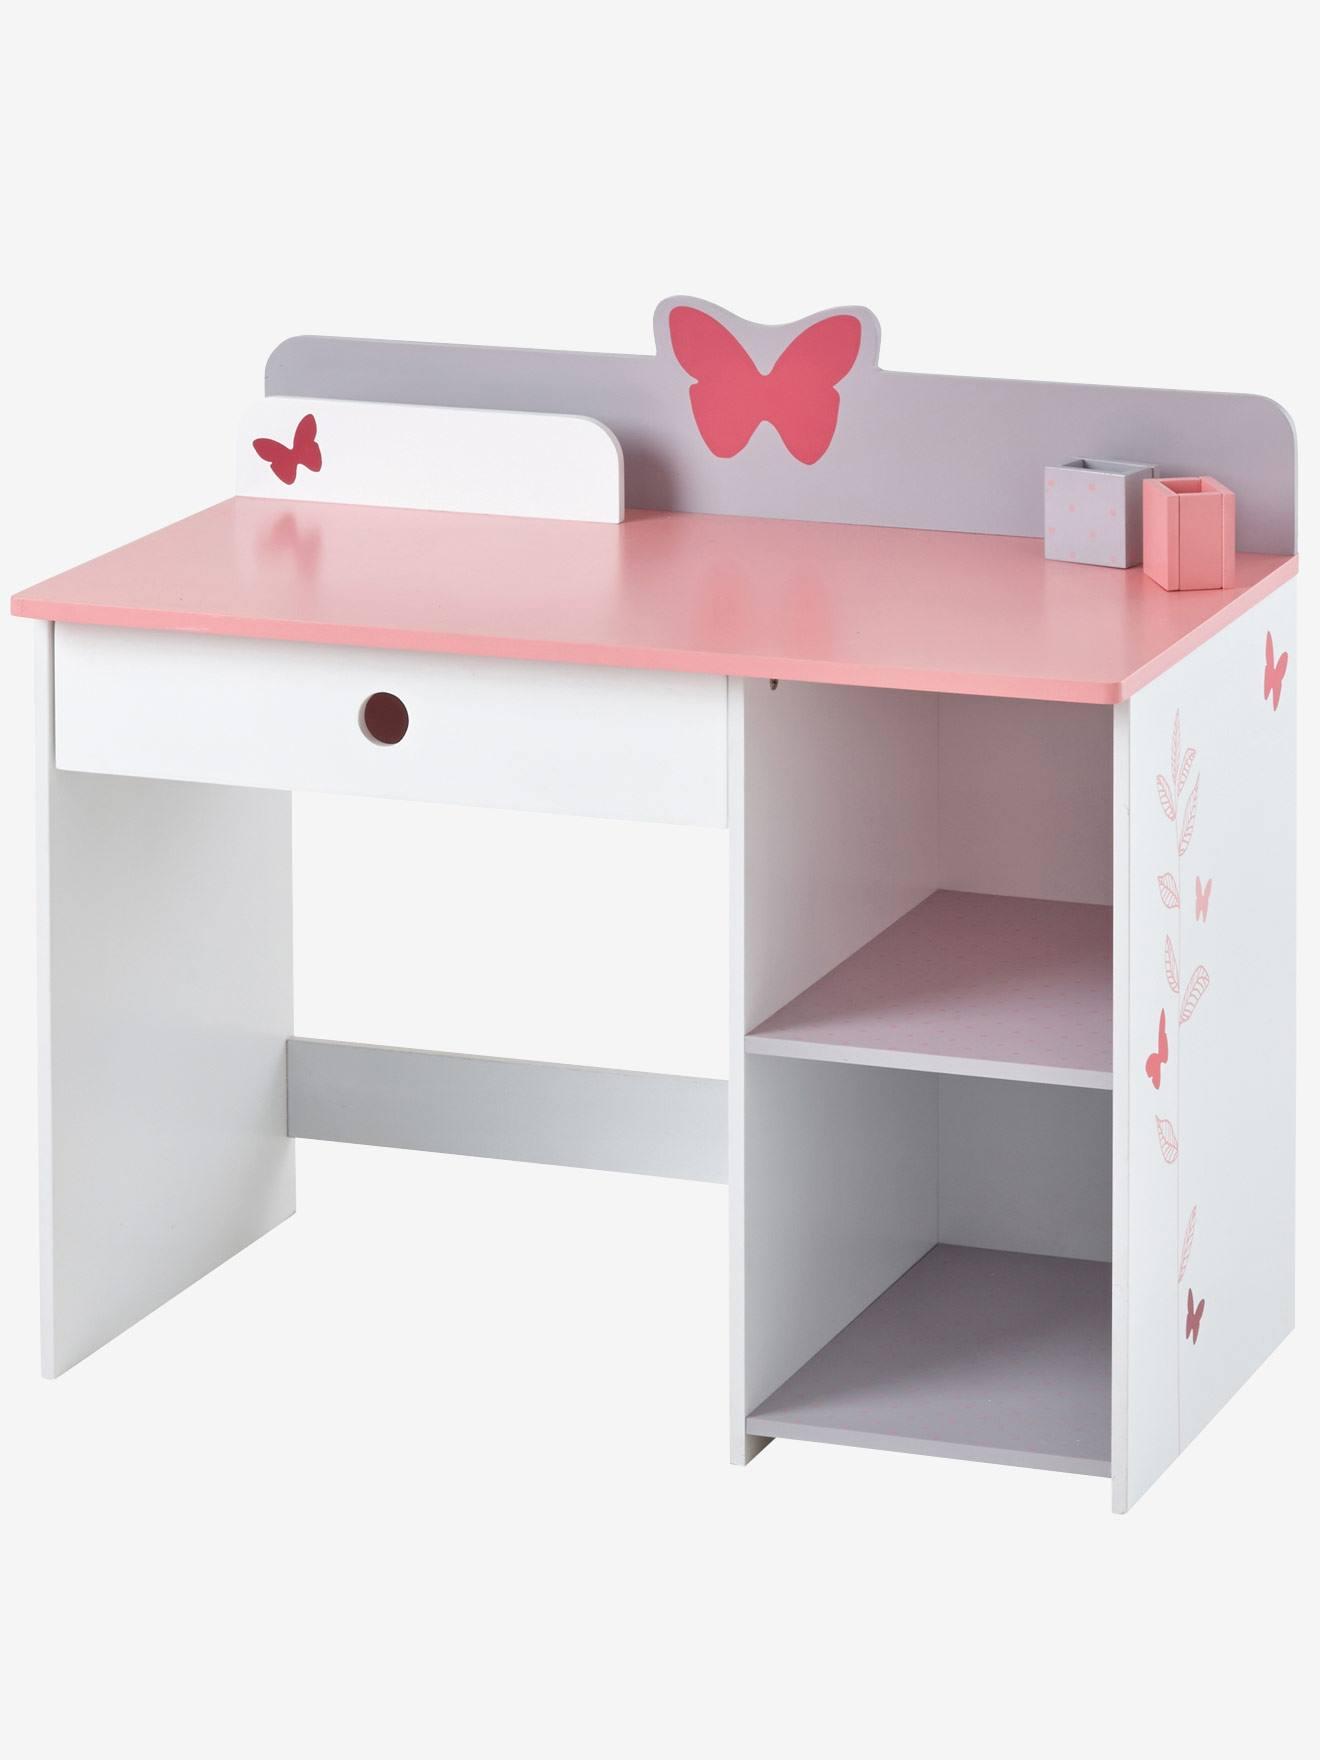 schreibtisch kind vertbaudet kinderzimmer kinderzimmermoebel kinderschreibtische b2b trade. Black Bedroom Furniture Sets. Home Design Ideas